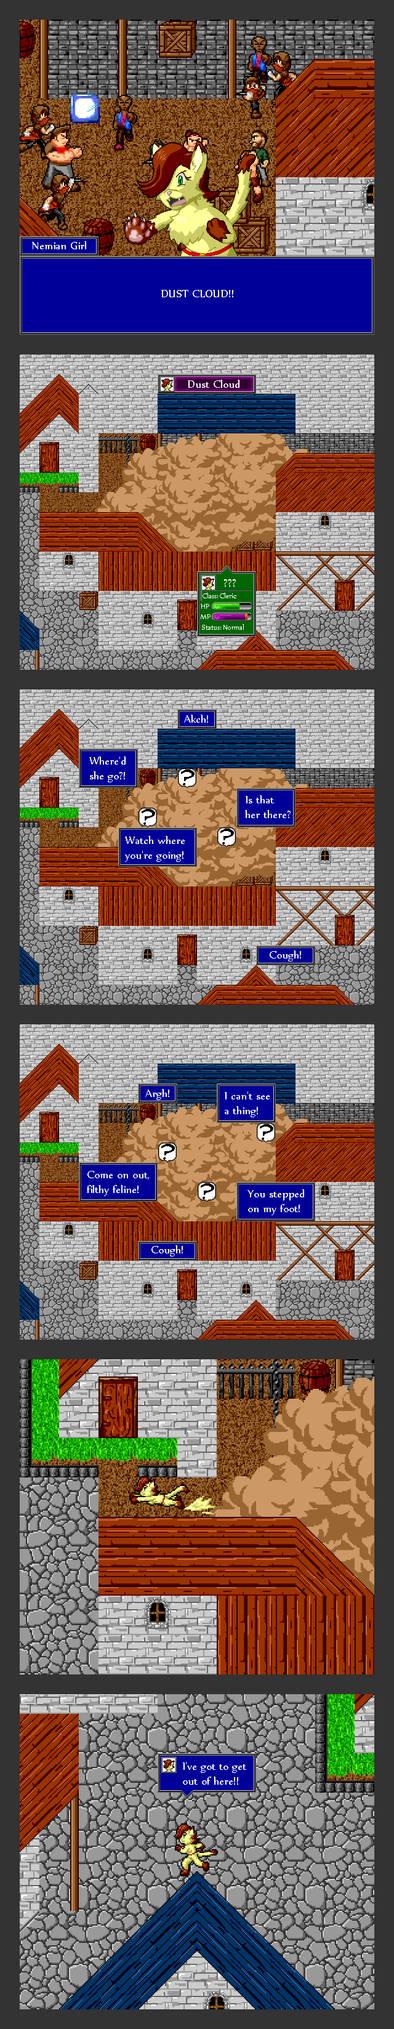 Adventurers' Guild Episode 01 Page 15